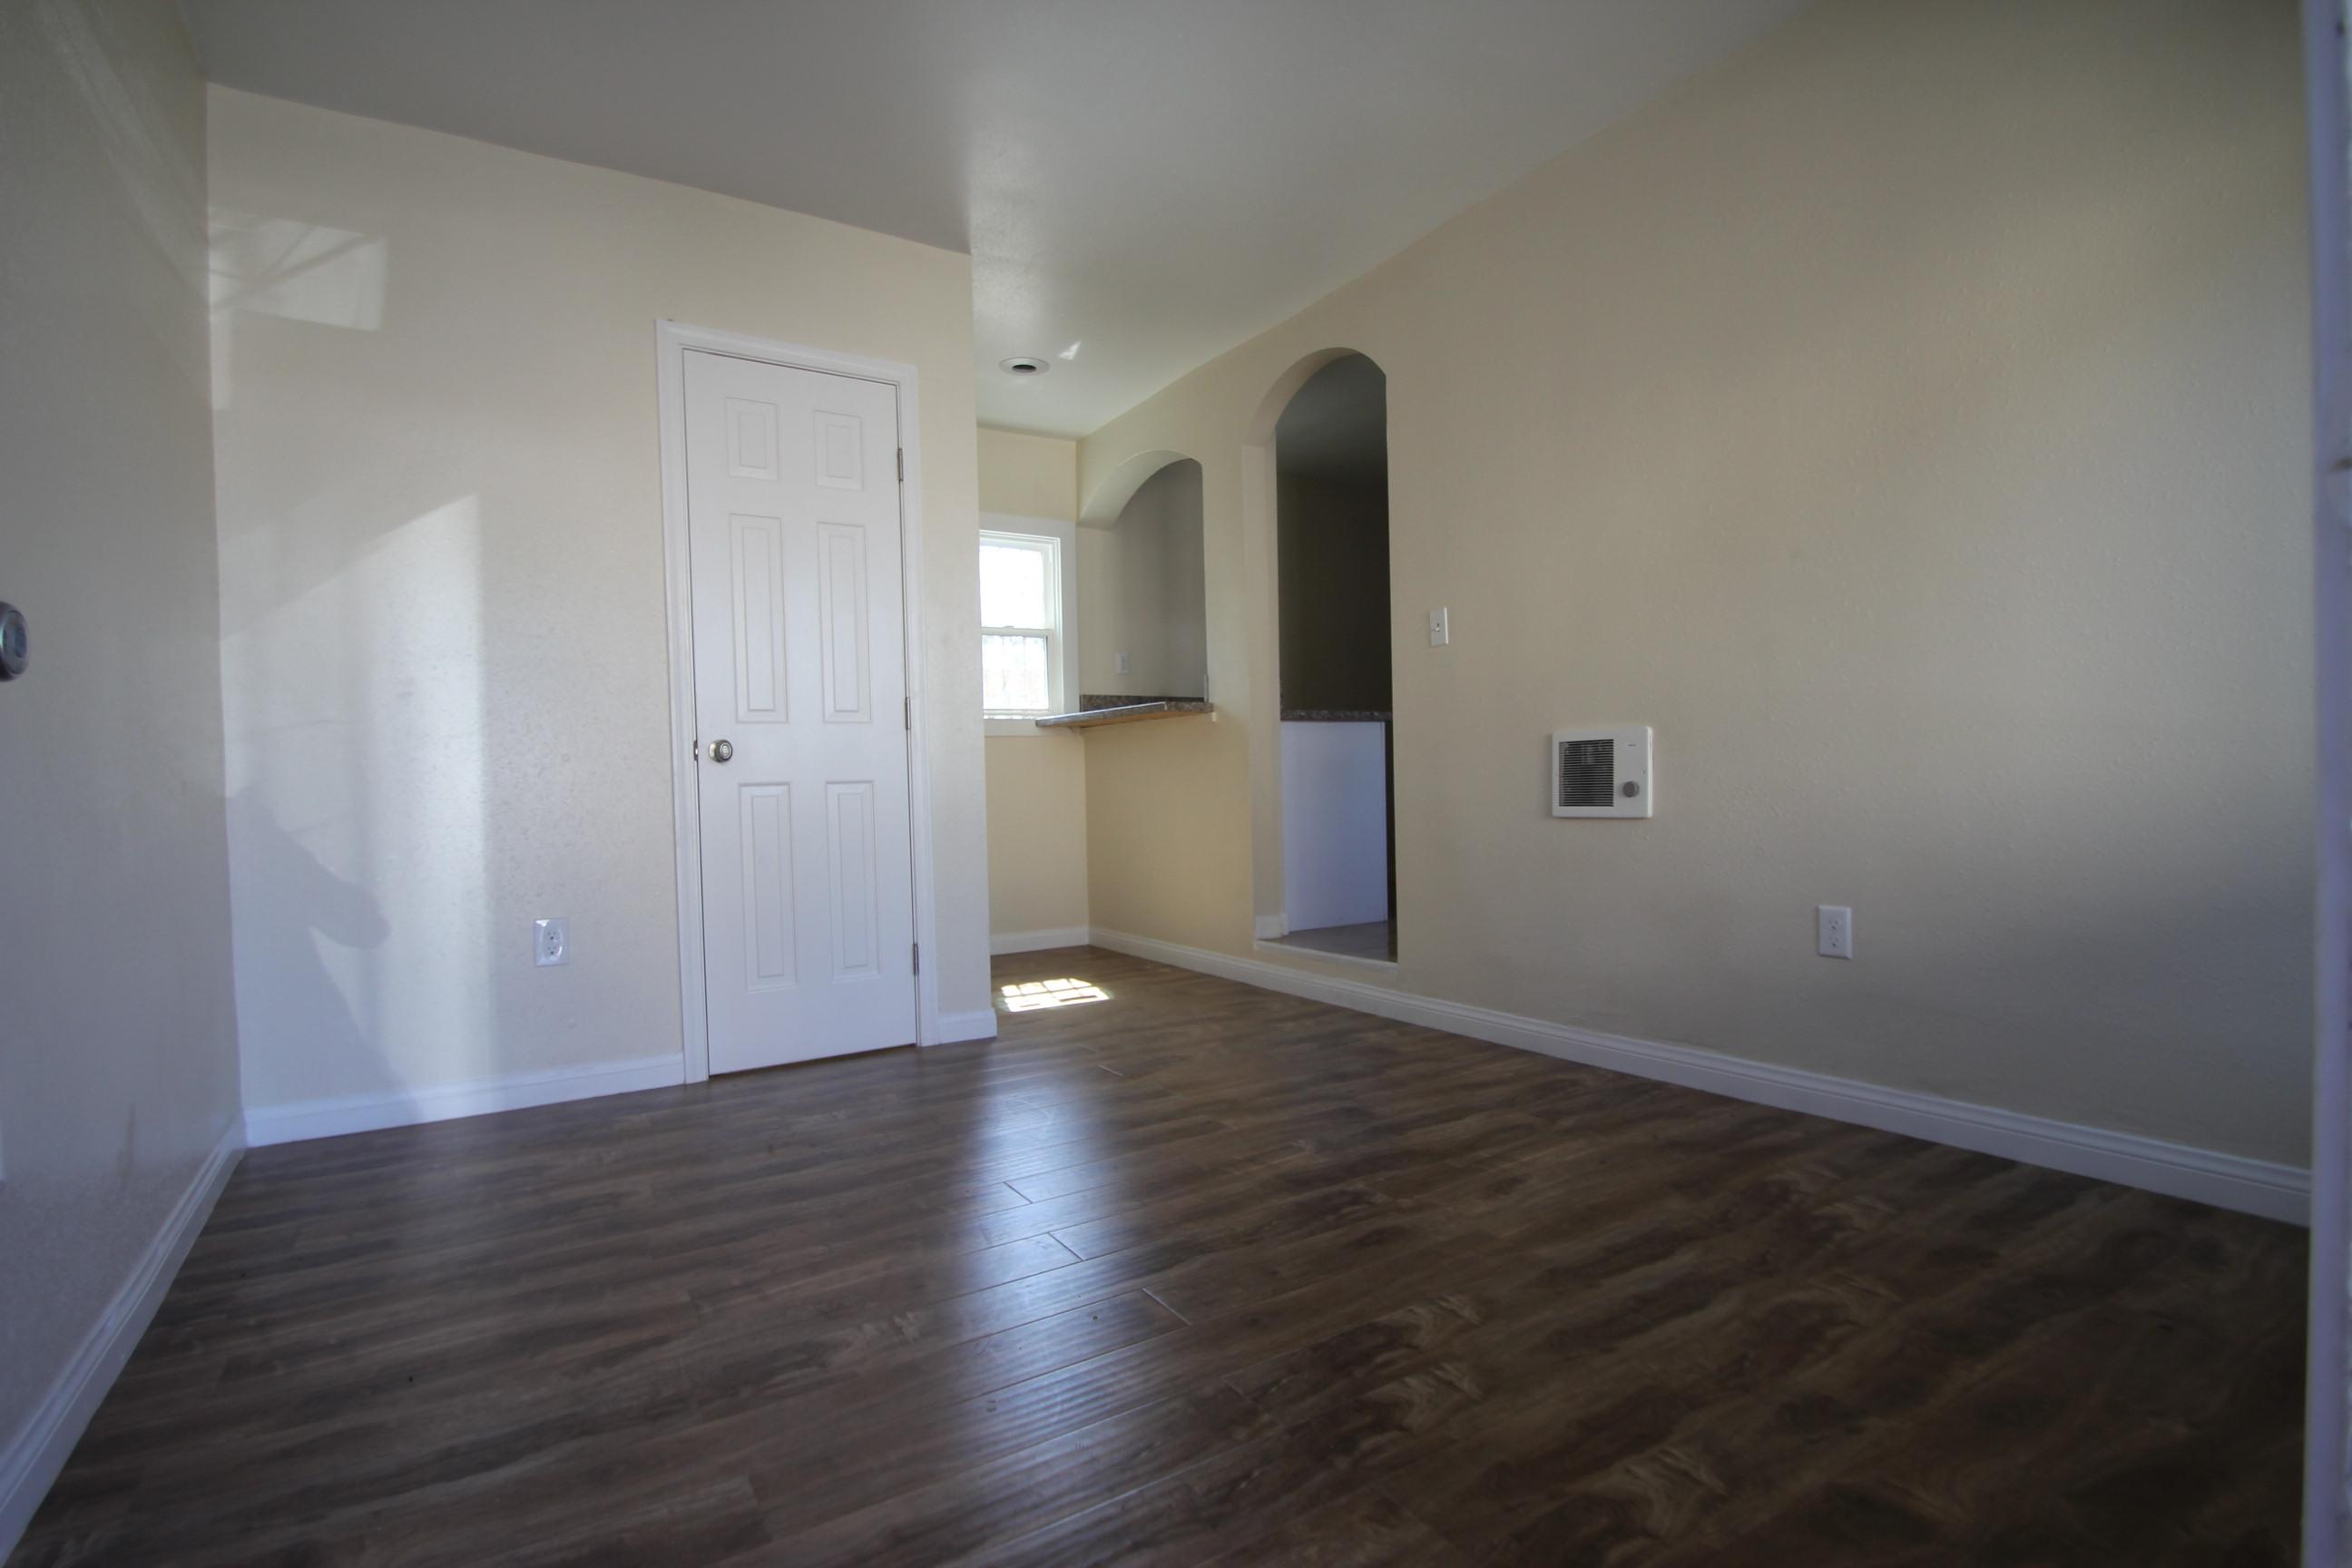 1294 Jefferson, Los Angeles, California 90007, 1 Bedroom Bedrooms, ,1 BathroomBathrooms,Apartment,For Rent,Jefferson,2,1021